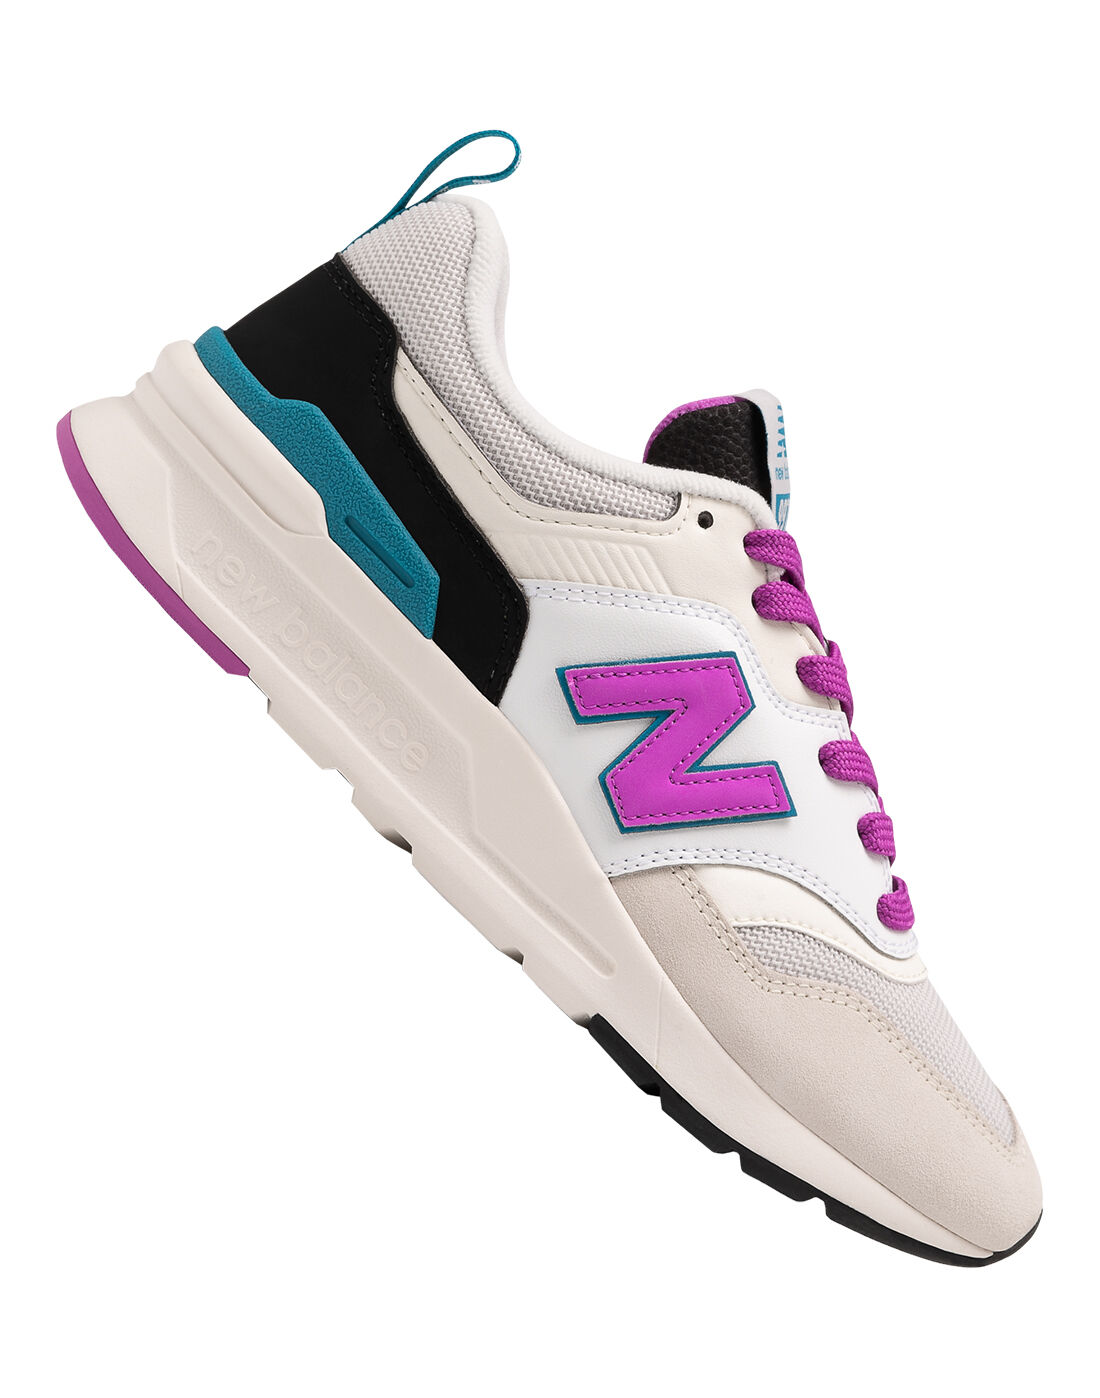 New Balance Womens 997H Trainers, Black & Pink